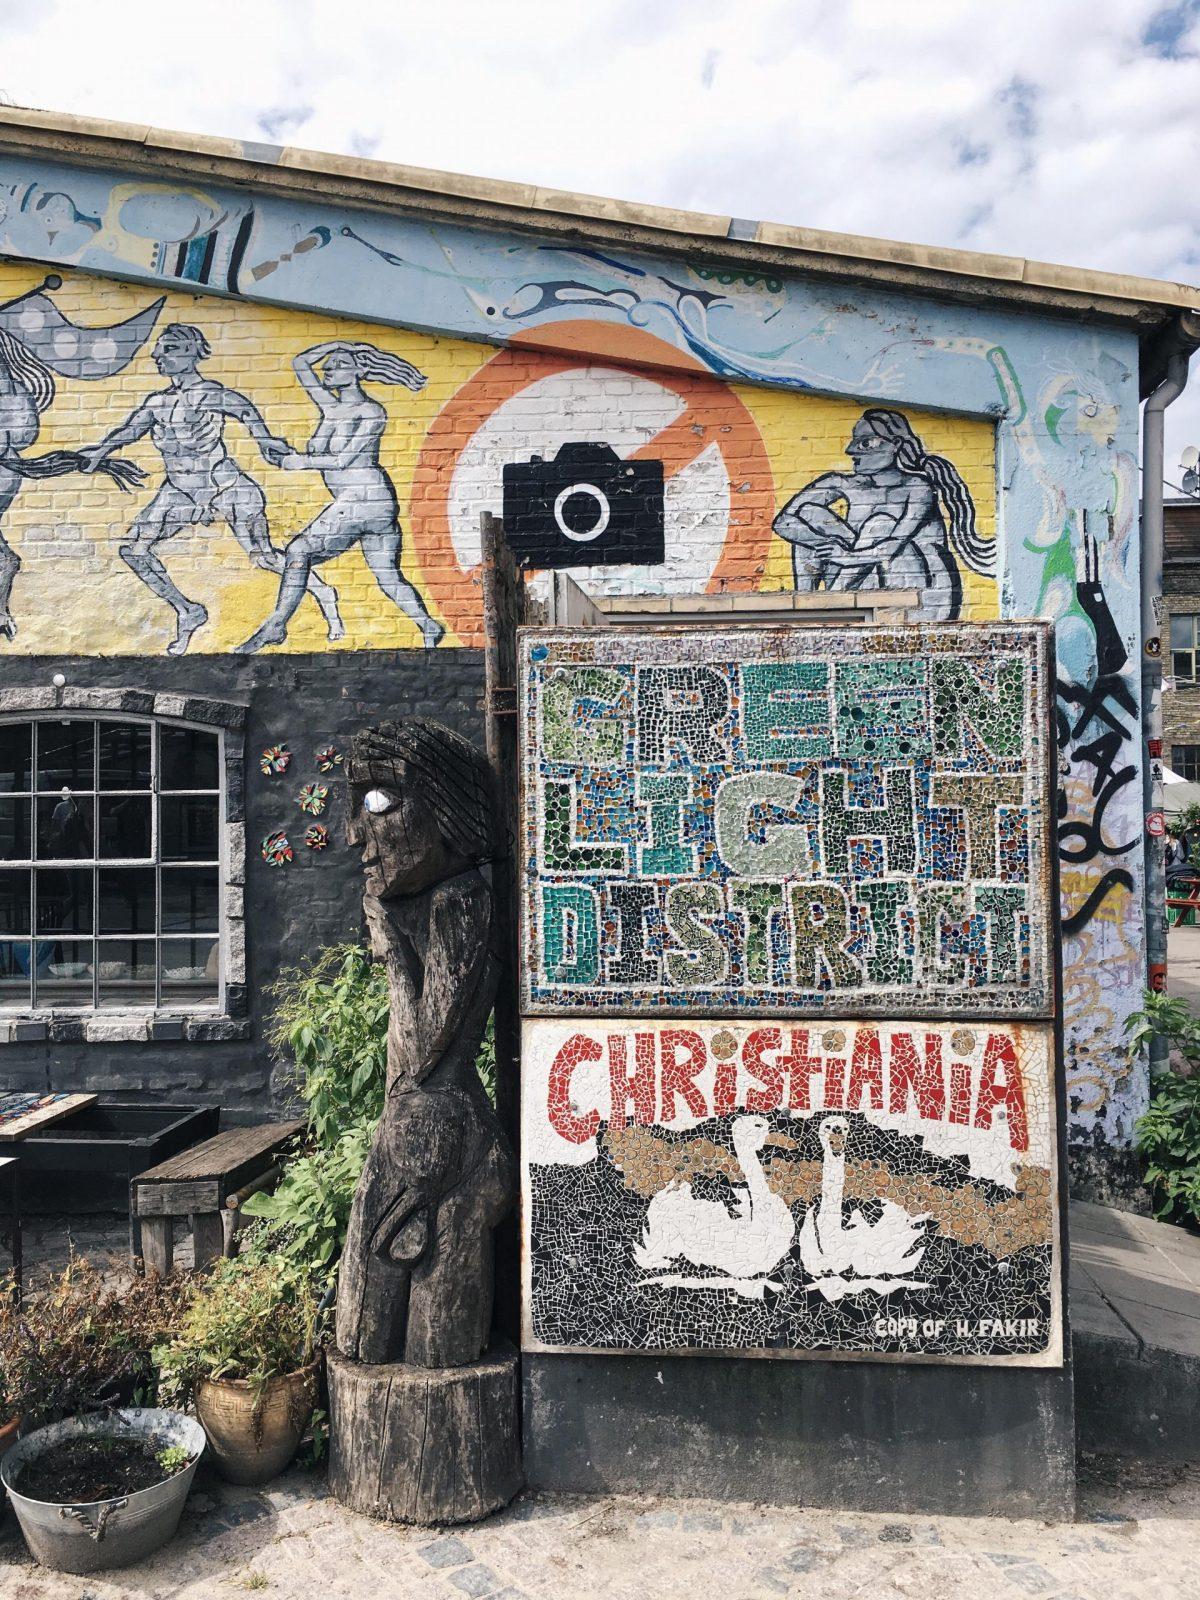 Familienausflug Kopenhagen Christiania | Pinspiration